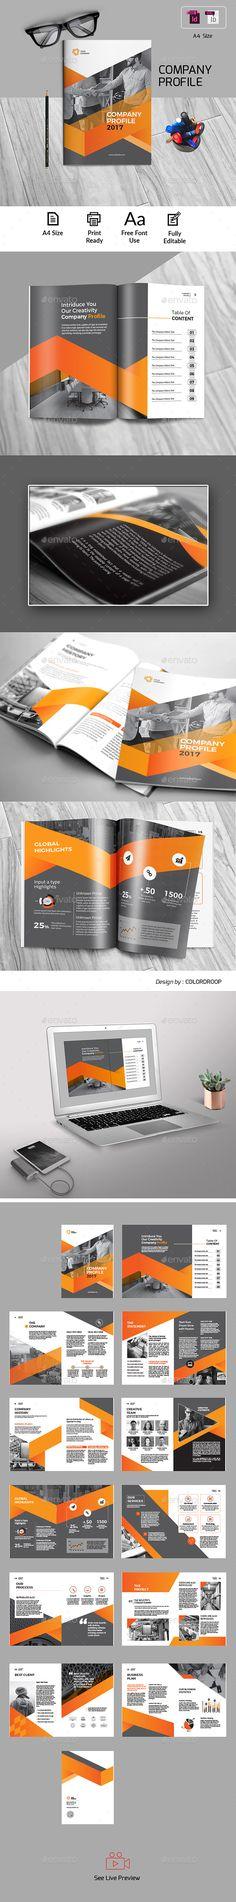 Luxury Brochure, Corporate Brochure Design, Business Brochure, Branding Design, Company Profile Template, Company Profile Design, Corporate Profile, Design Presentation, Travel Brochure Template